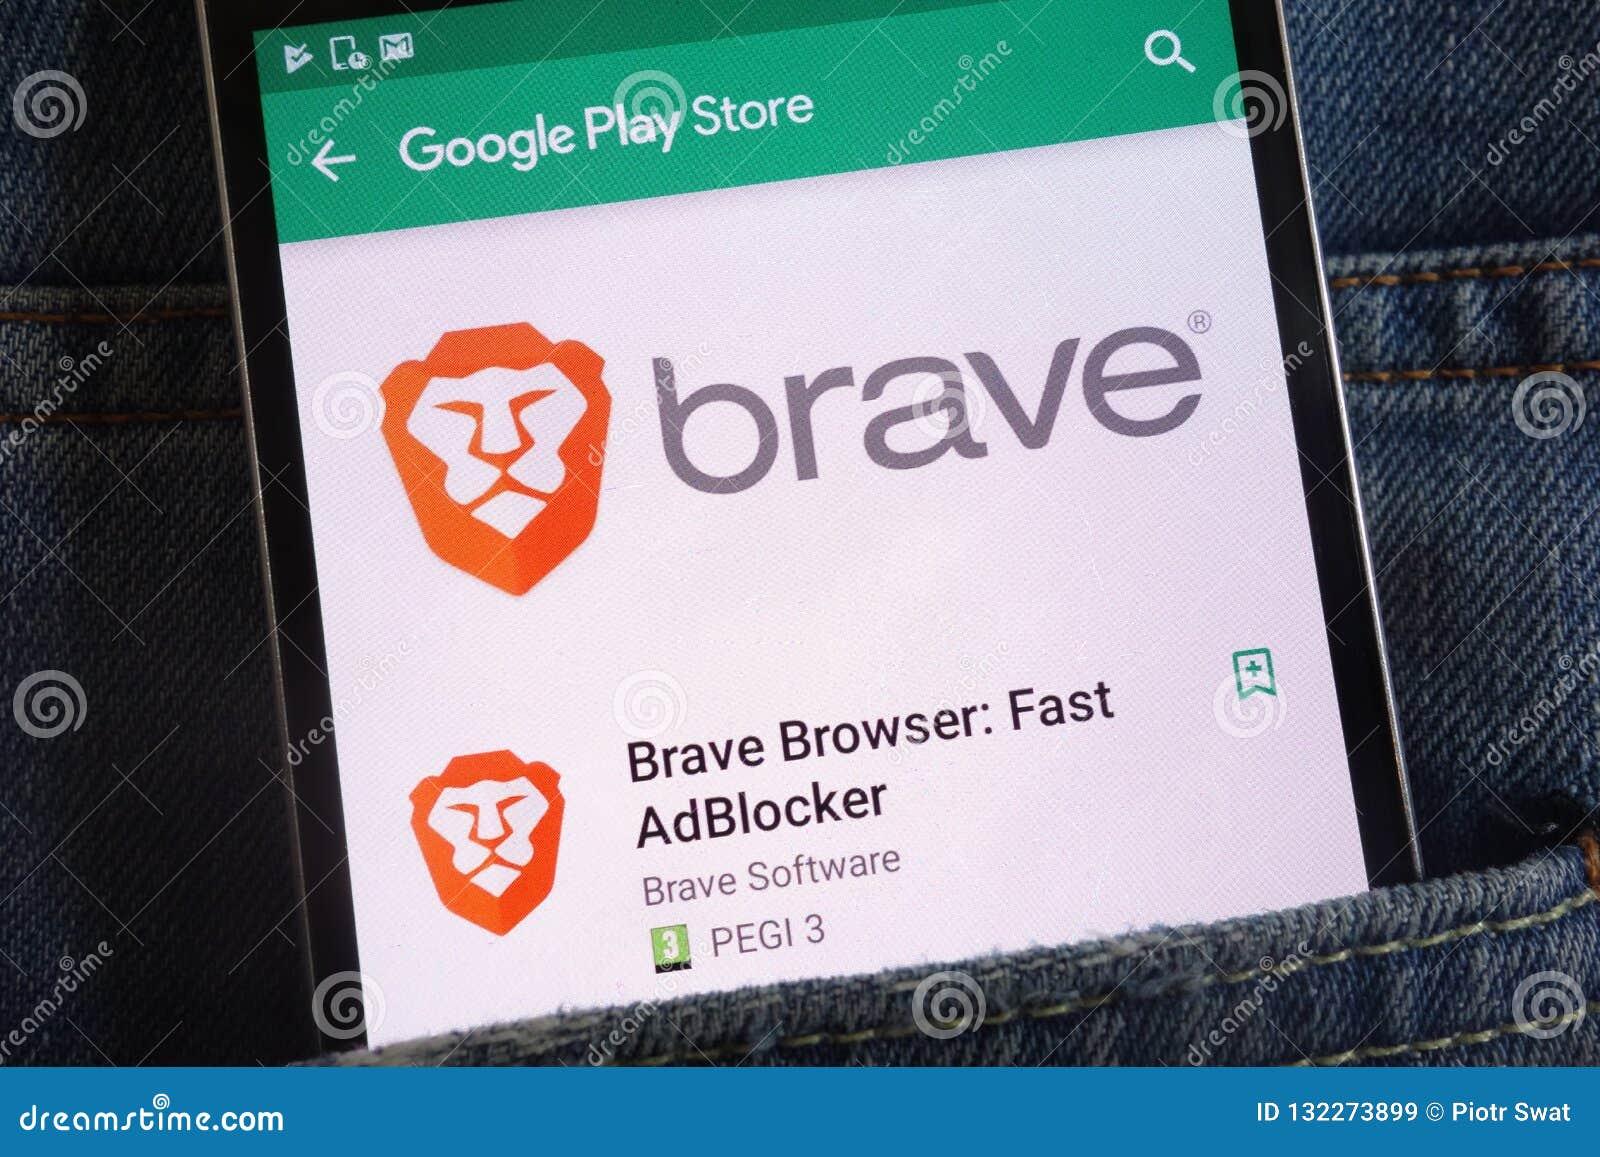 Brave Browser App On Google Play Store Website Displayed On